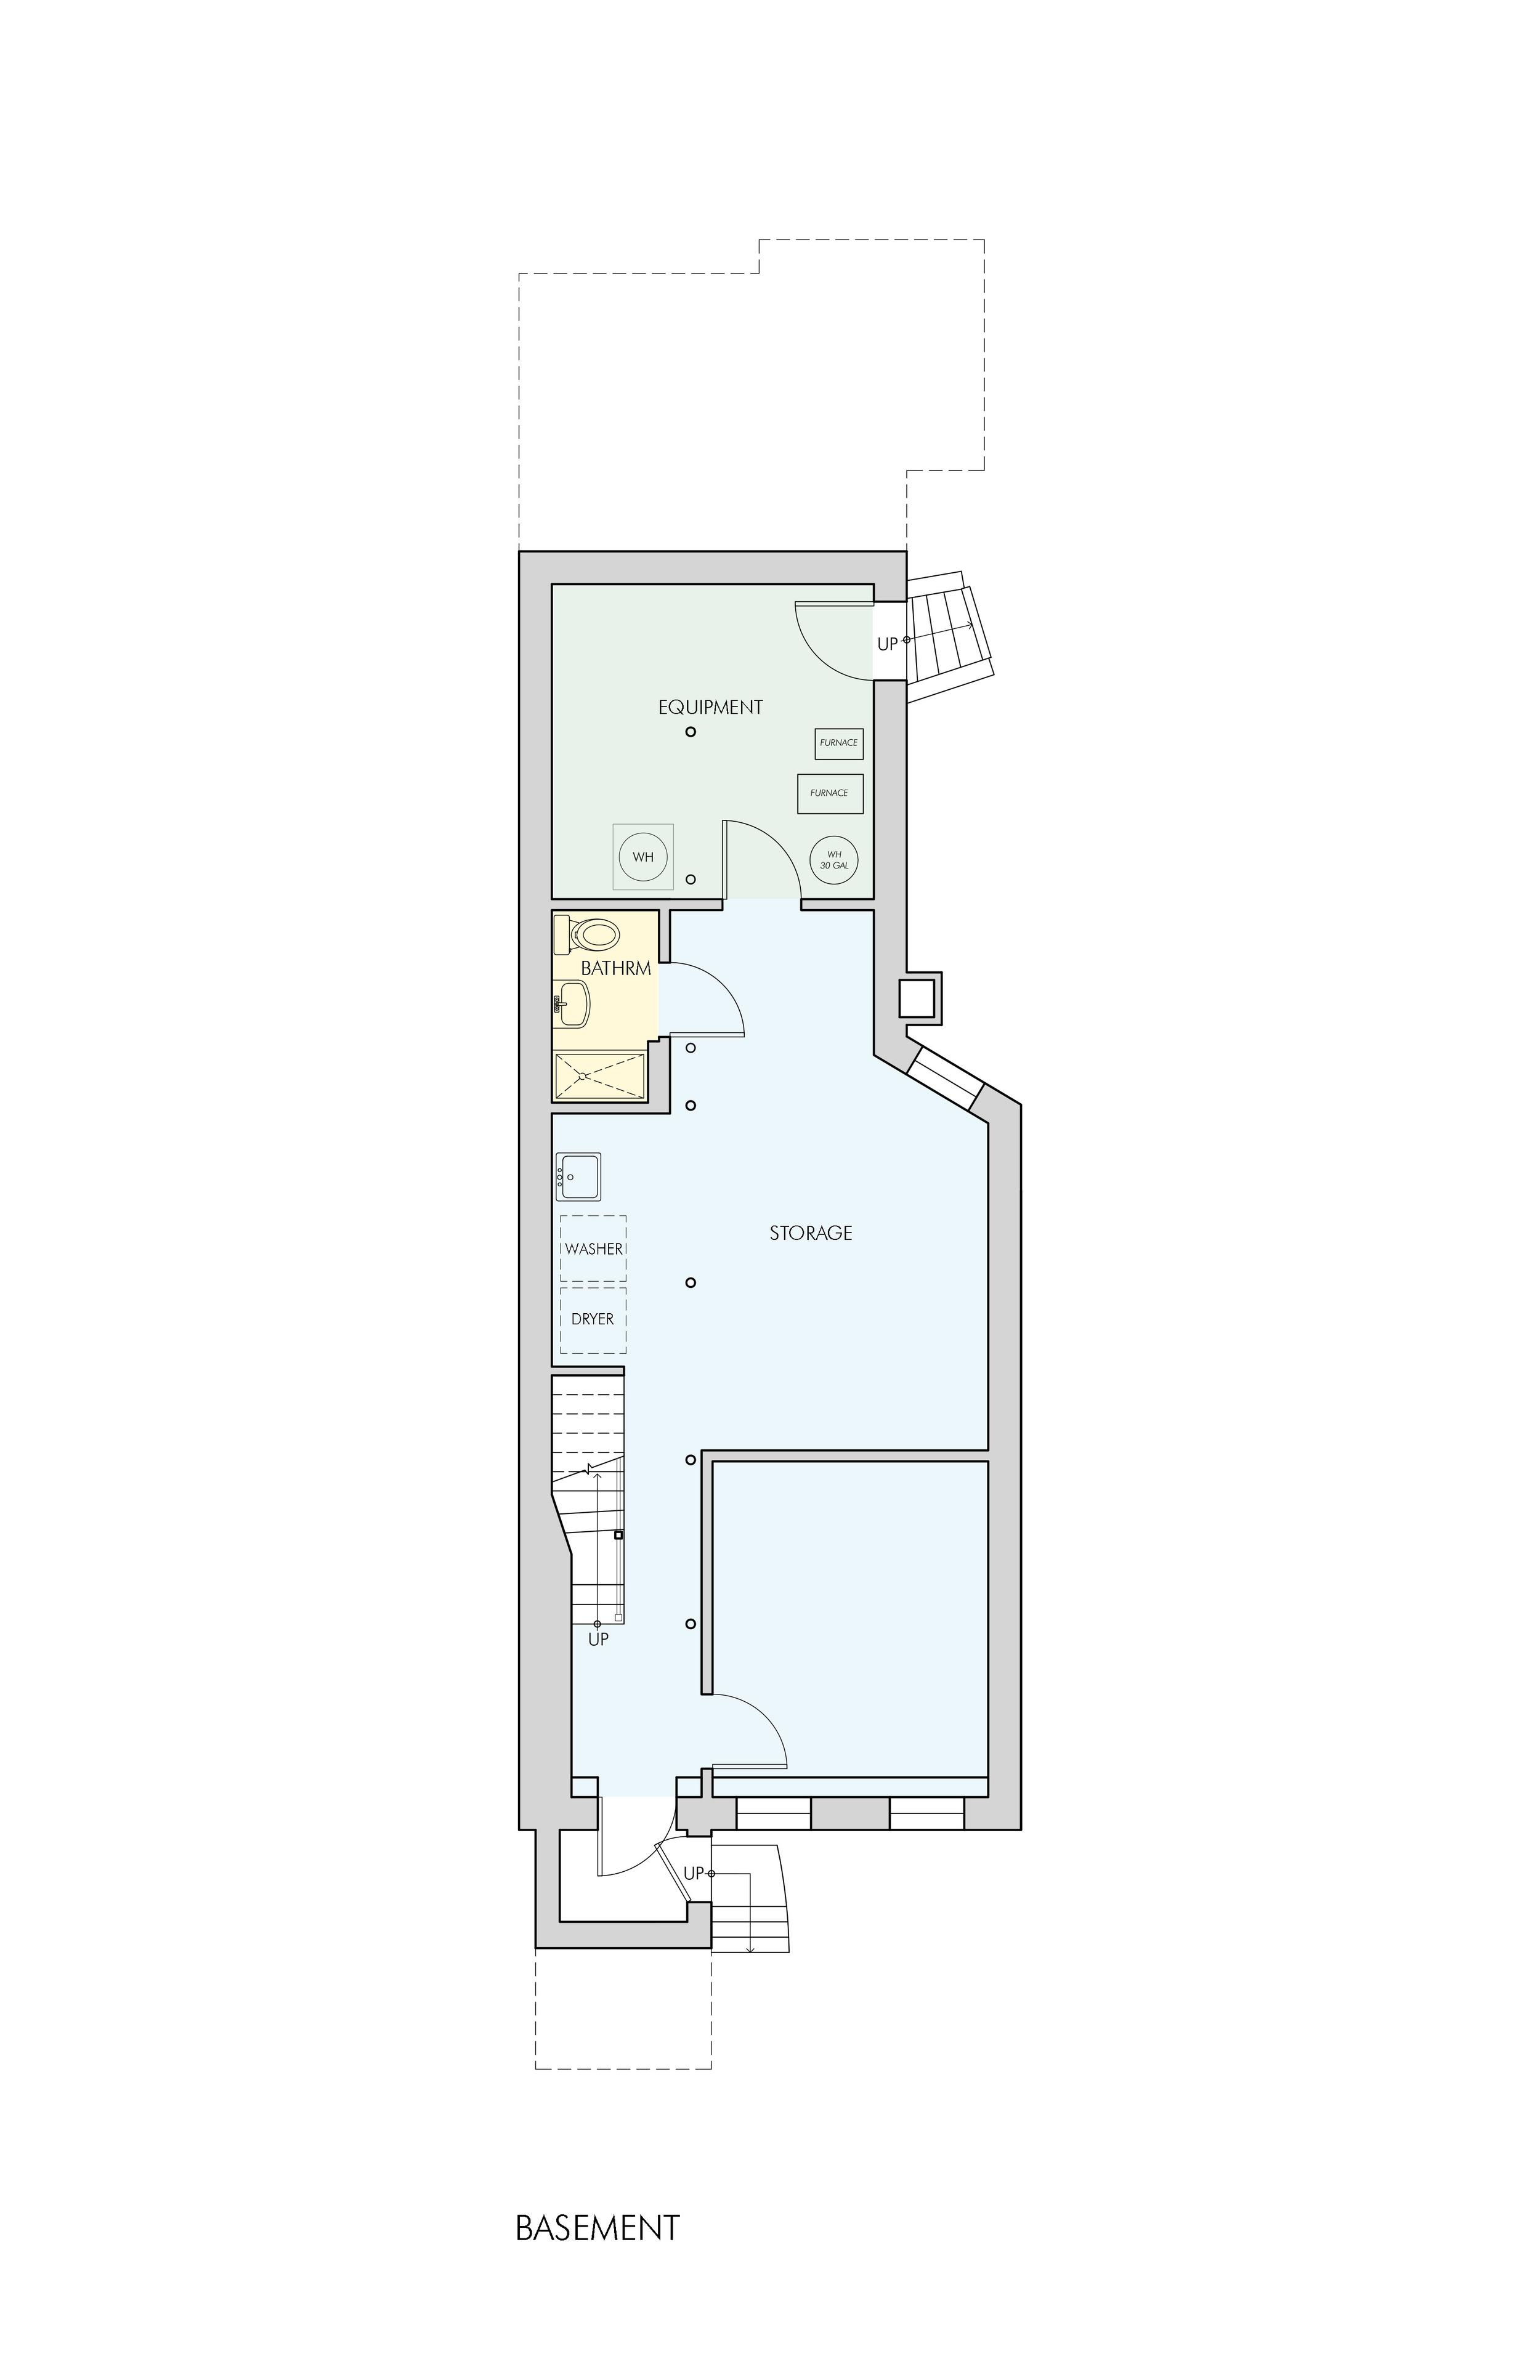 76 belmont_basement.jpg